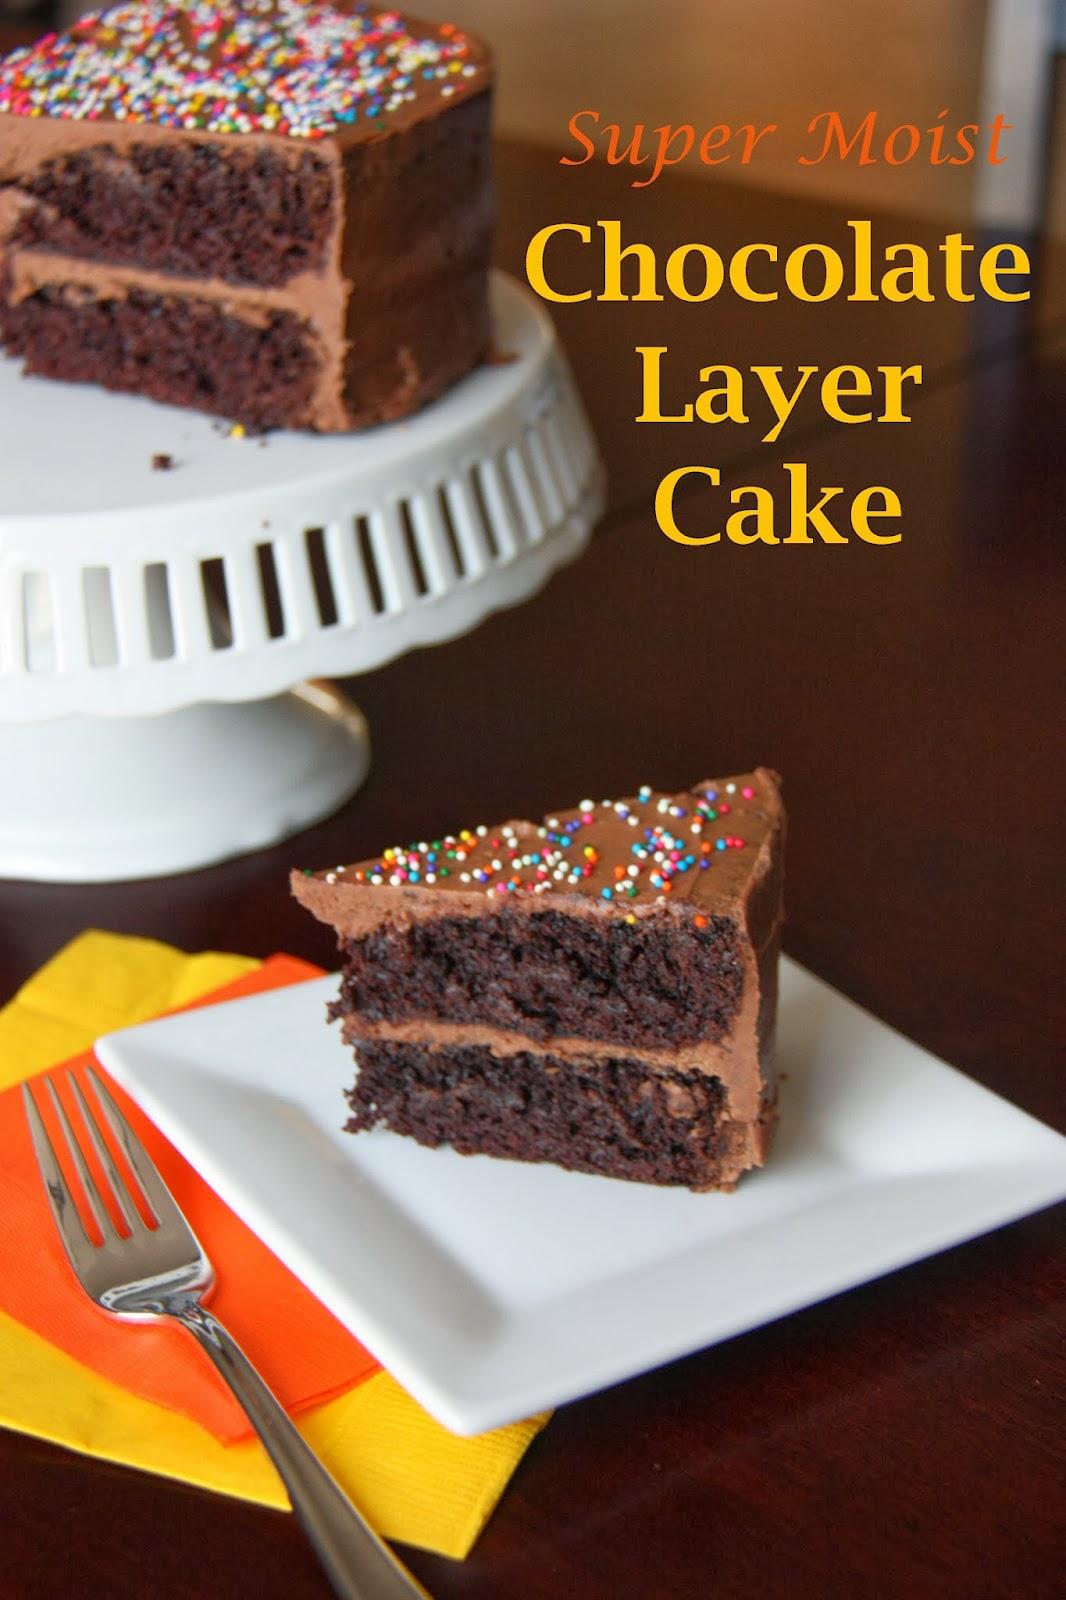 Super Moist Chocolate Cake Recipe With Buttermilk